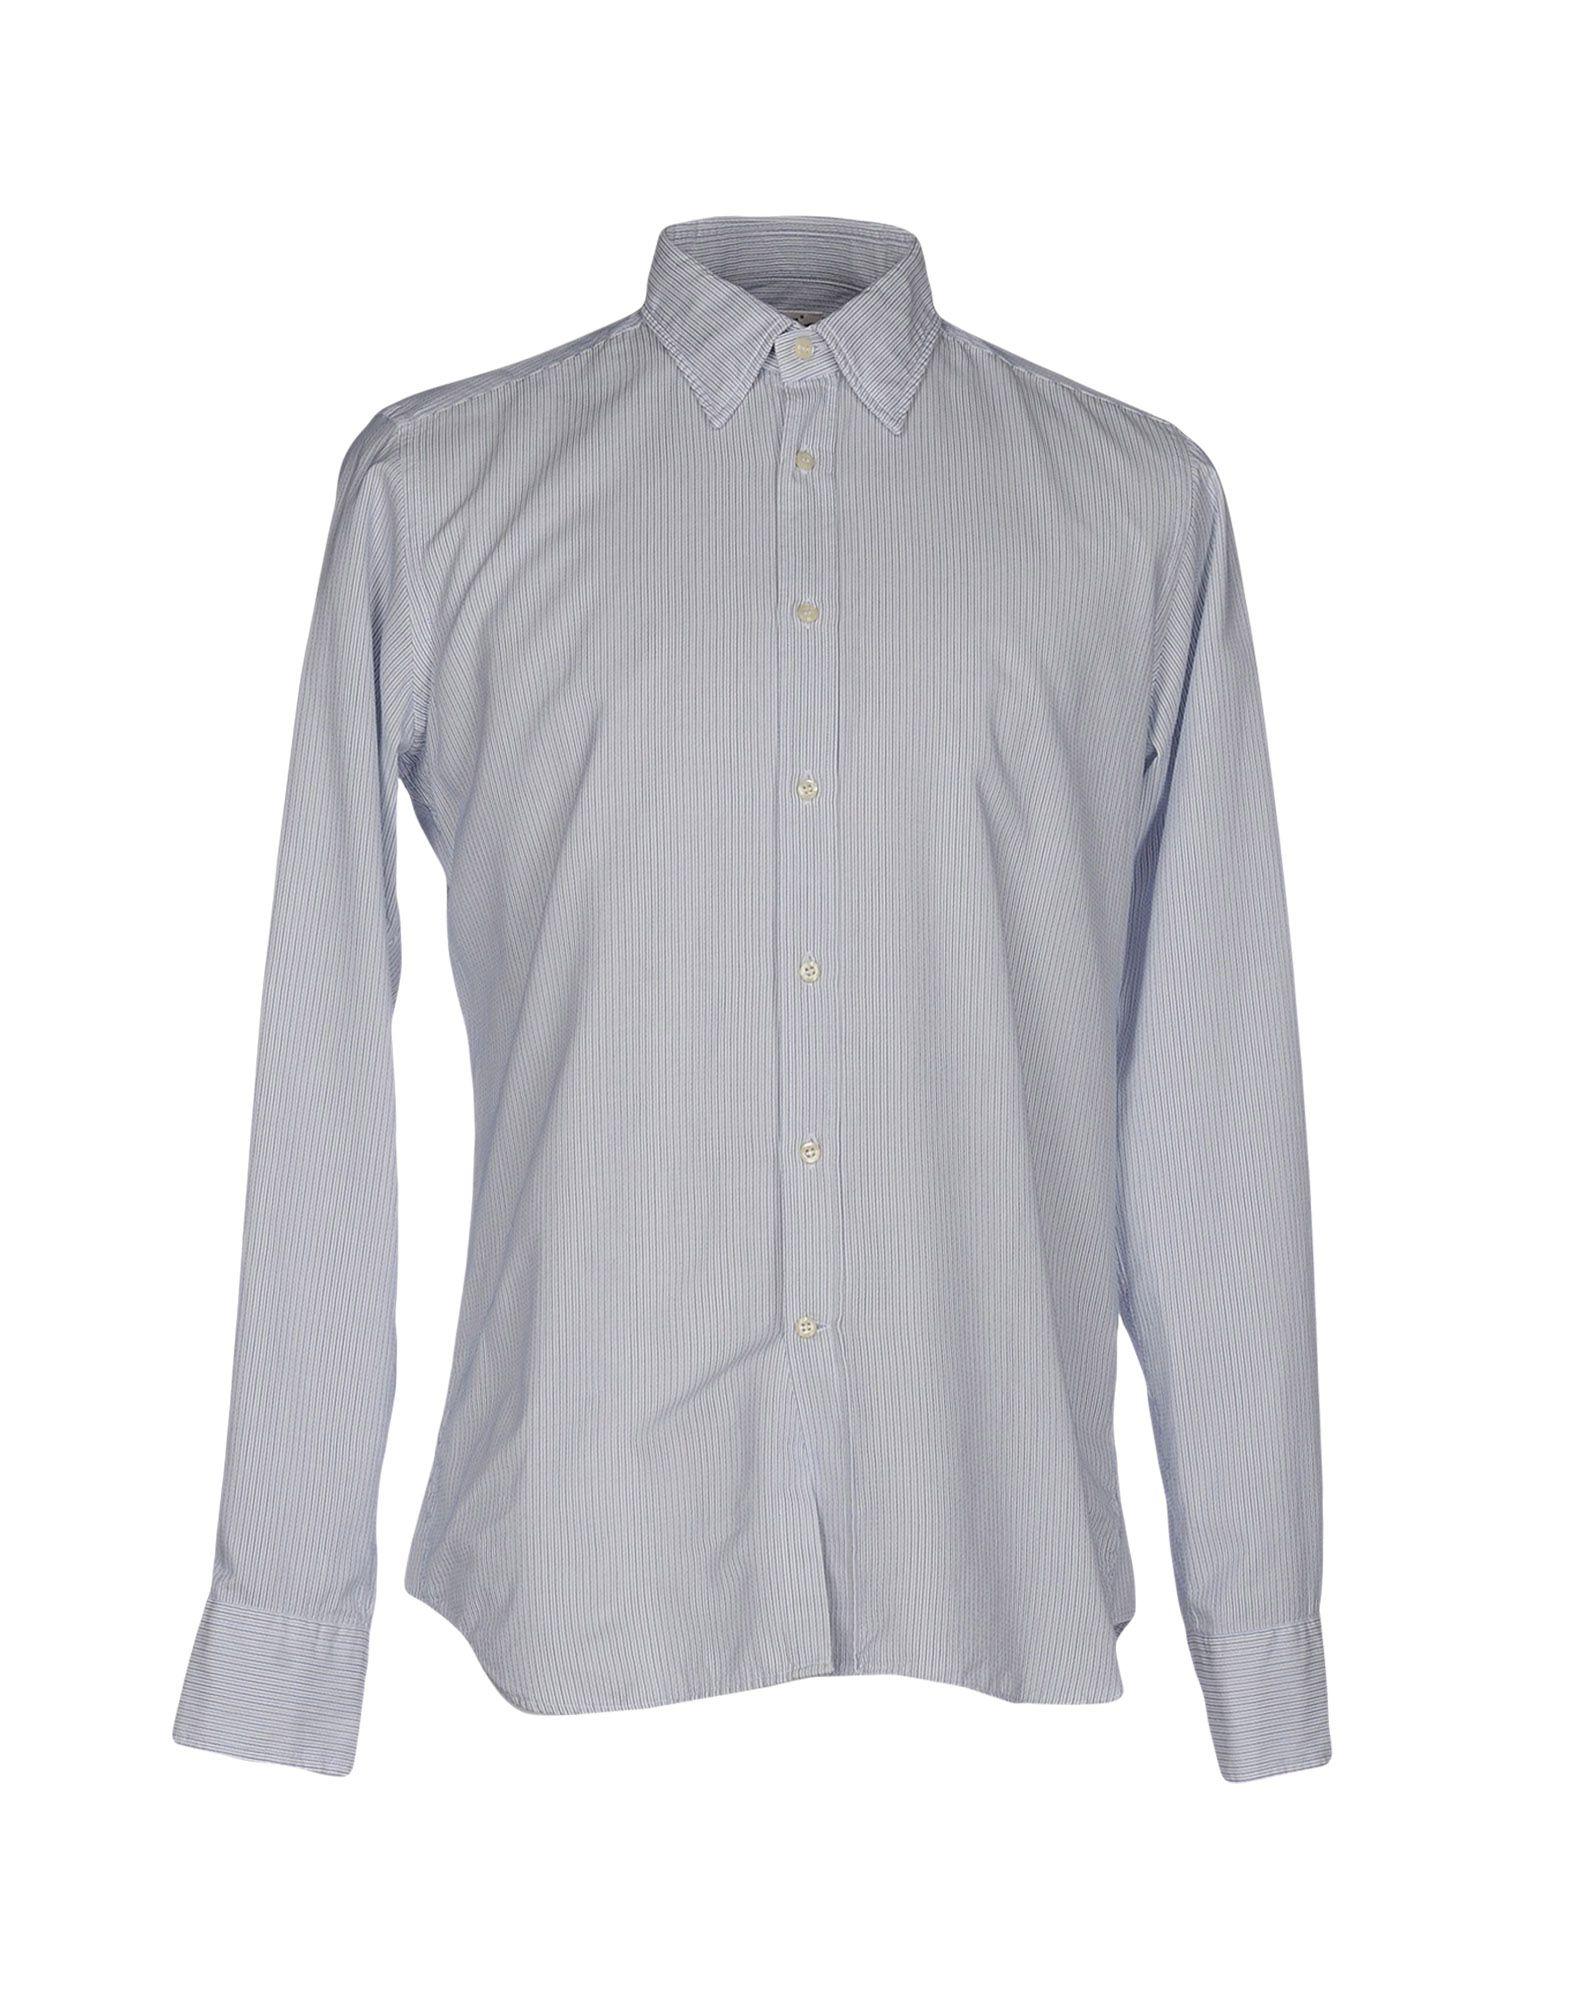 BEVILACQUA Striped Shirt in Blue